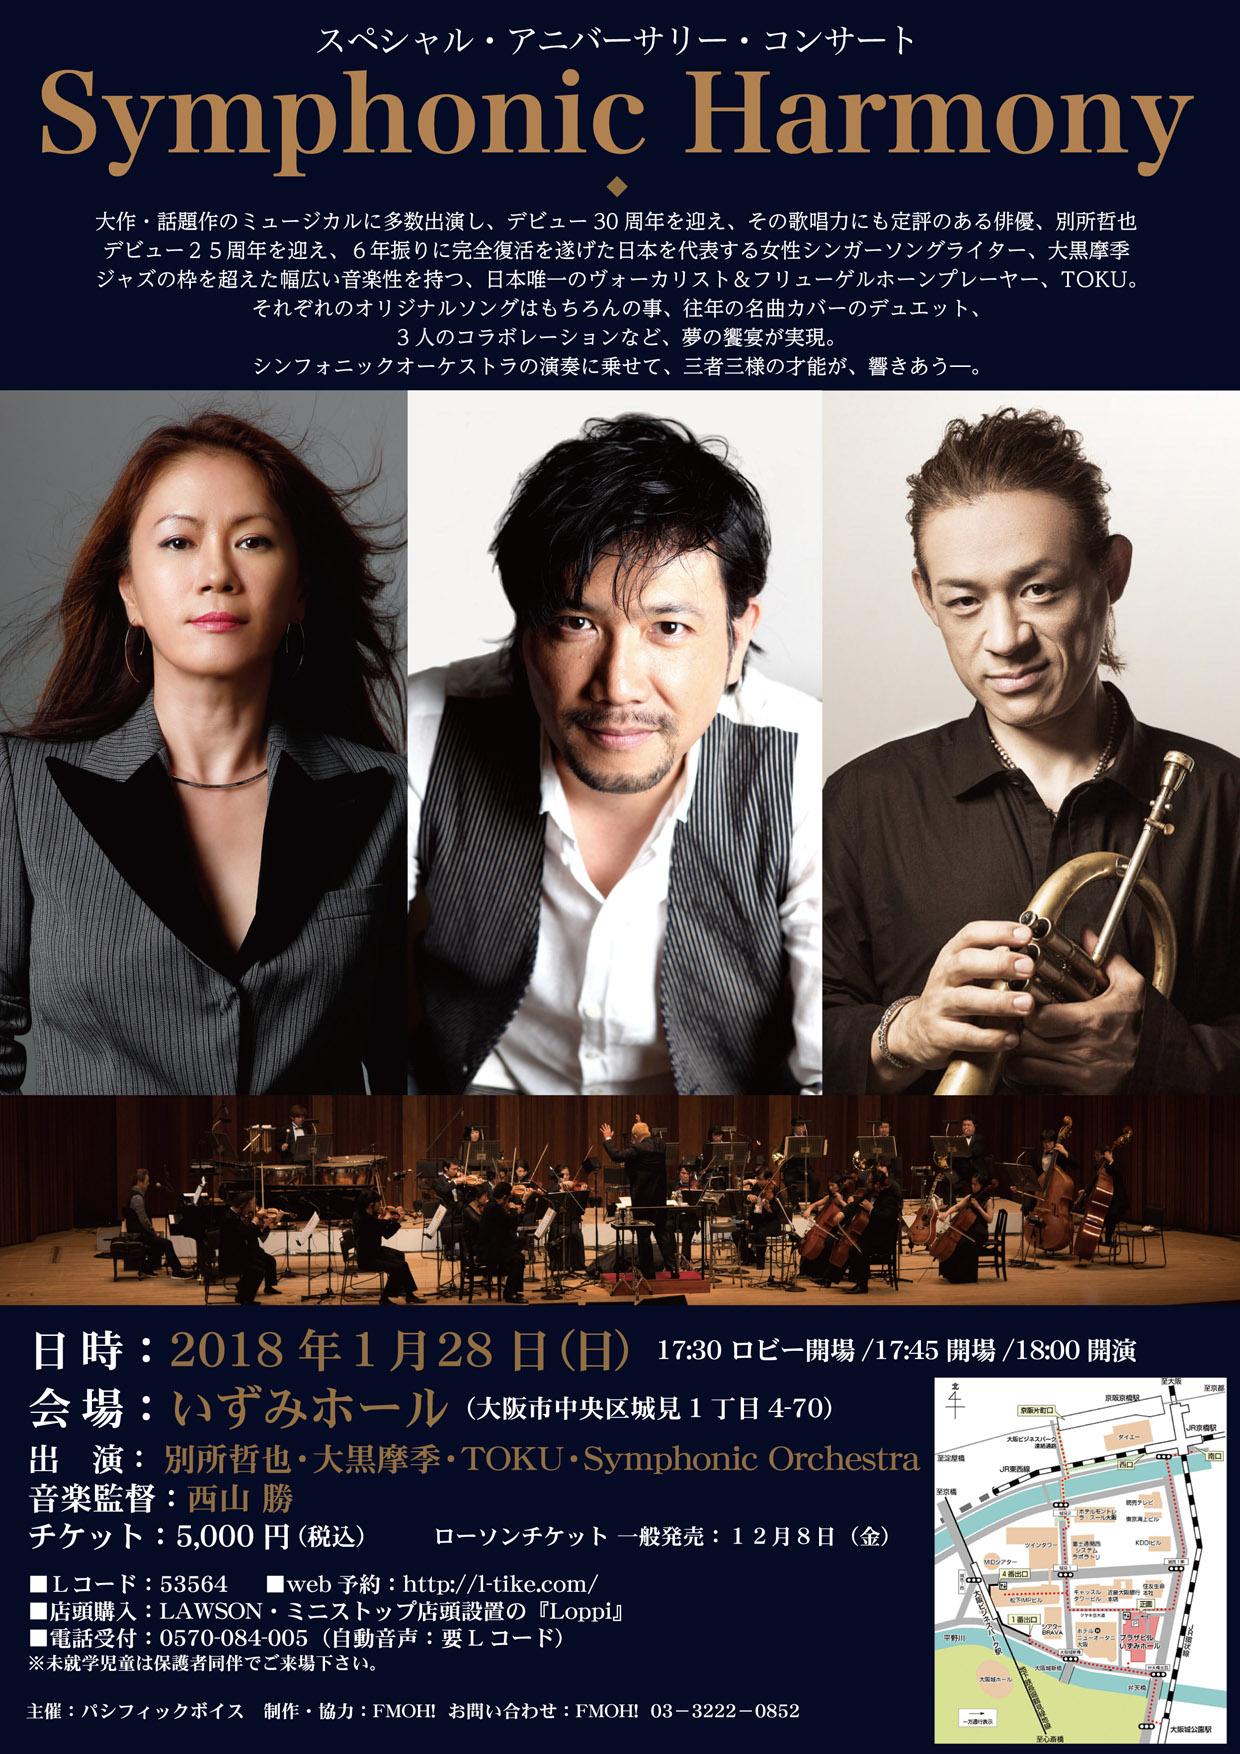 Symphonic Harmony